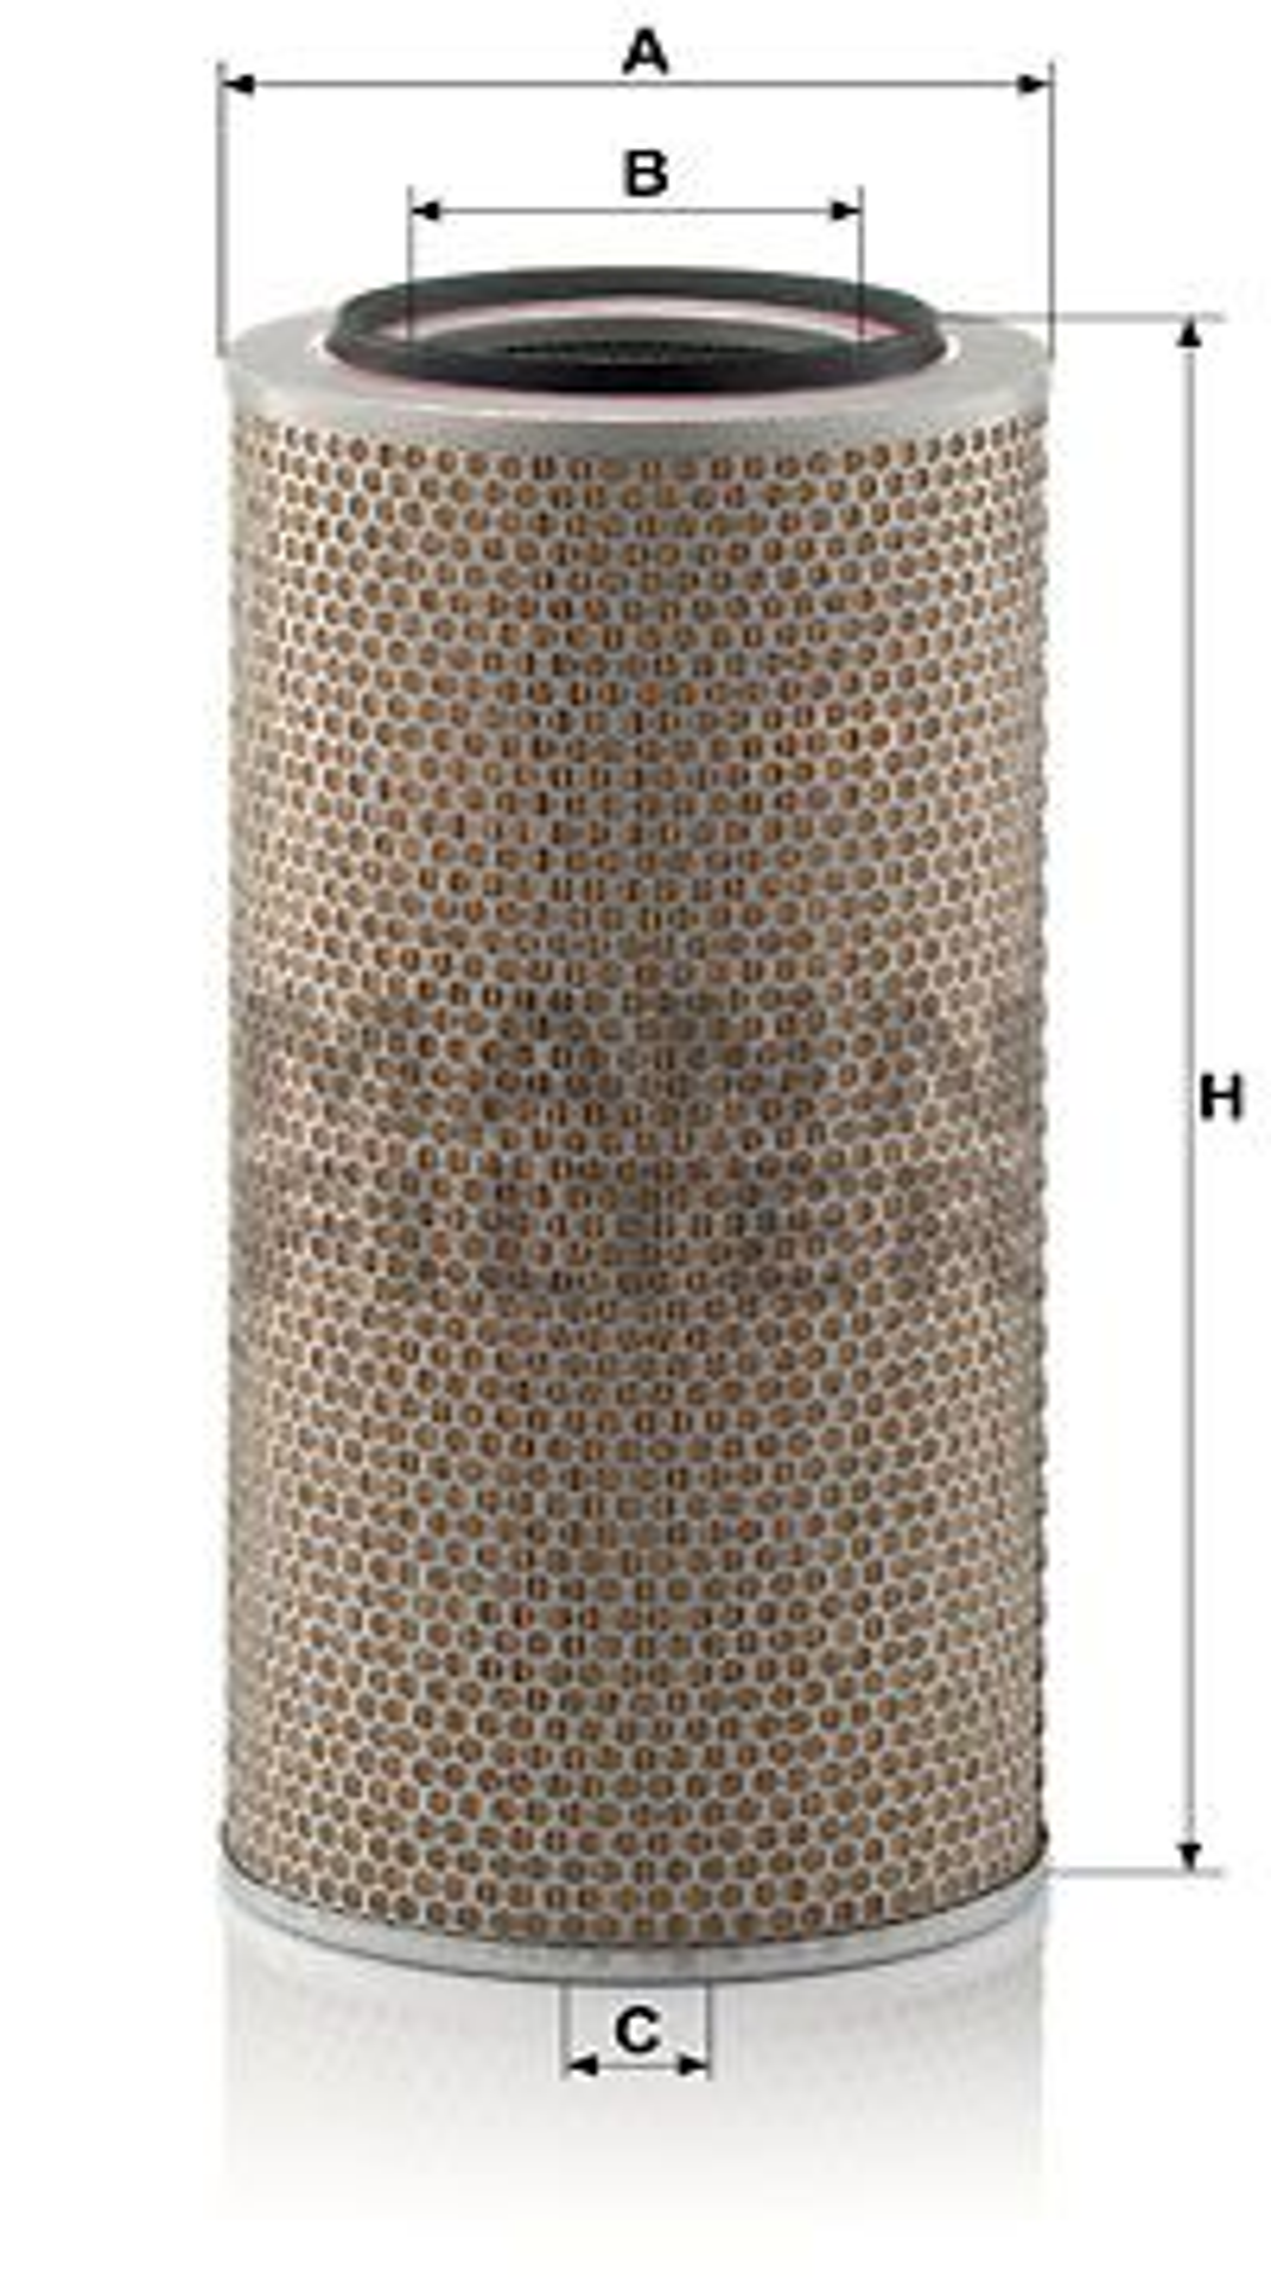 MANN-FILTER: Original Luftfilter C 24 650/1 (Höhe: 498mm)